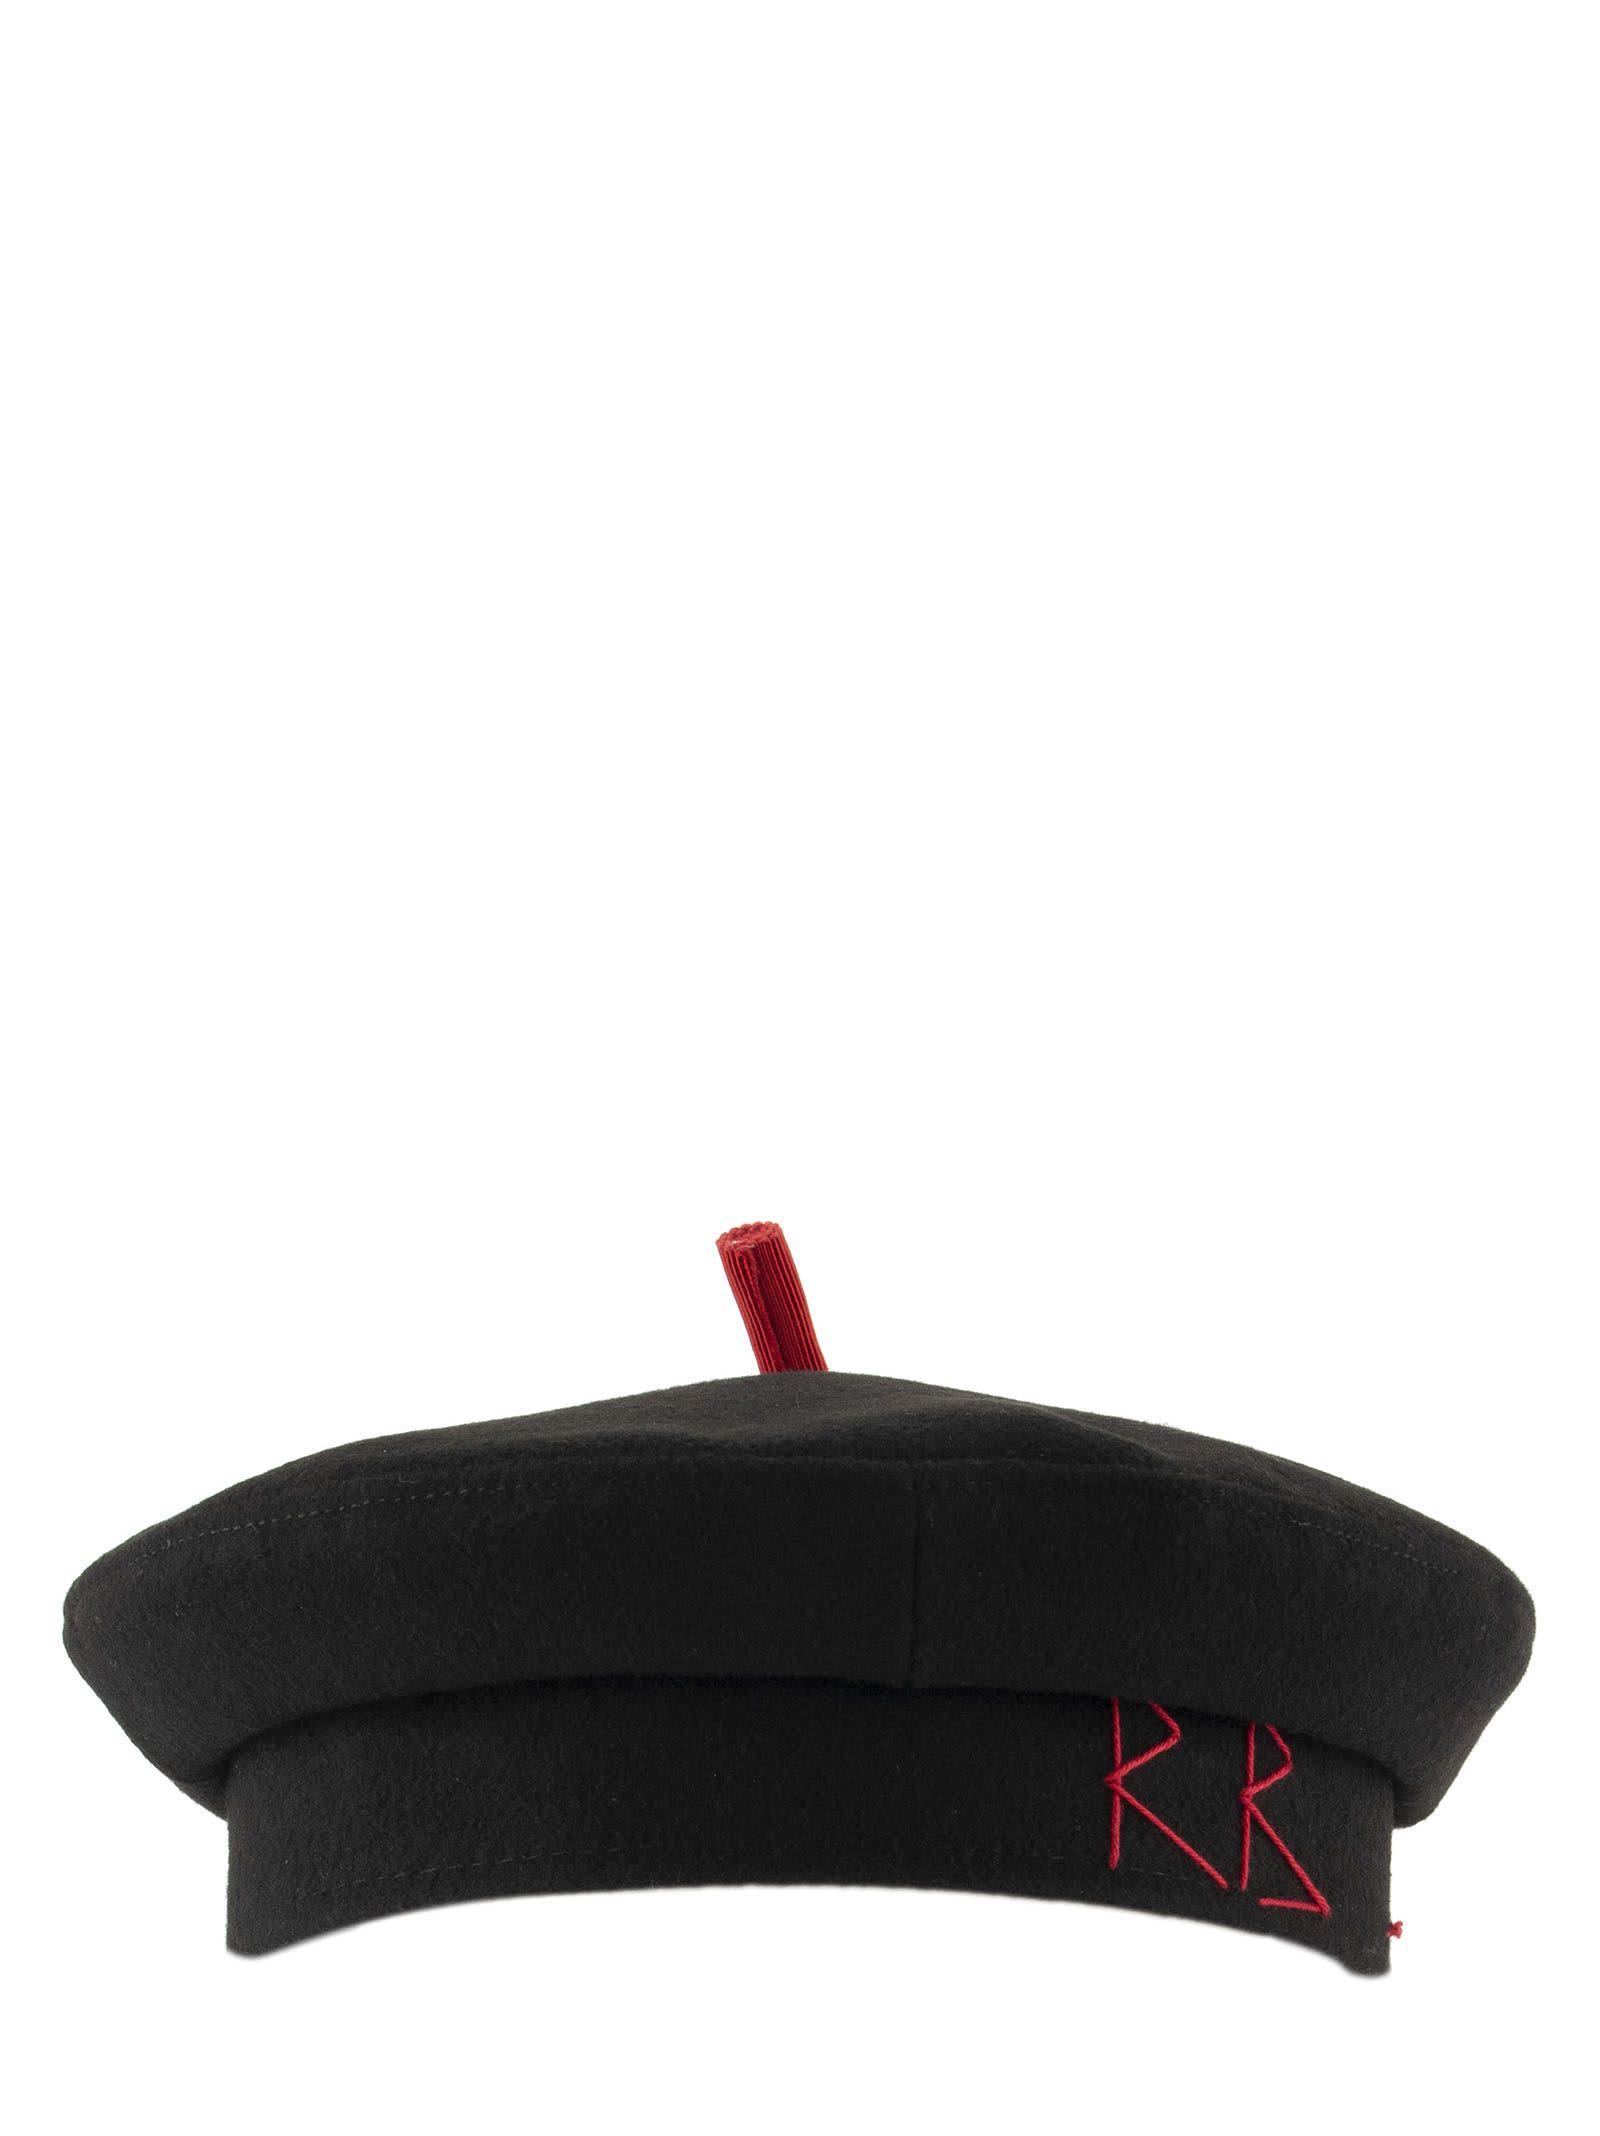 Ruslan Baginskiy Black Barret Wool Cap With Red Details / Hat